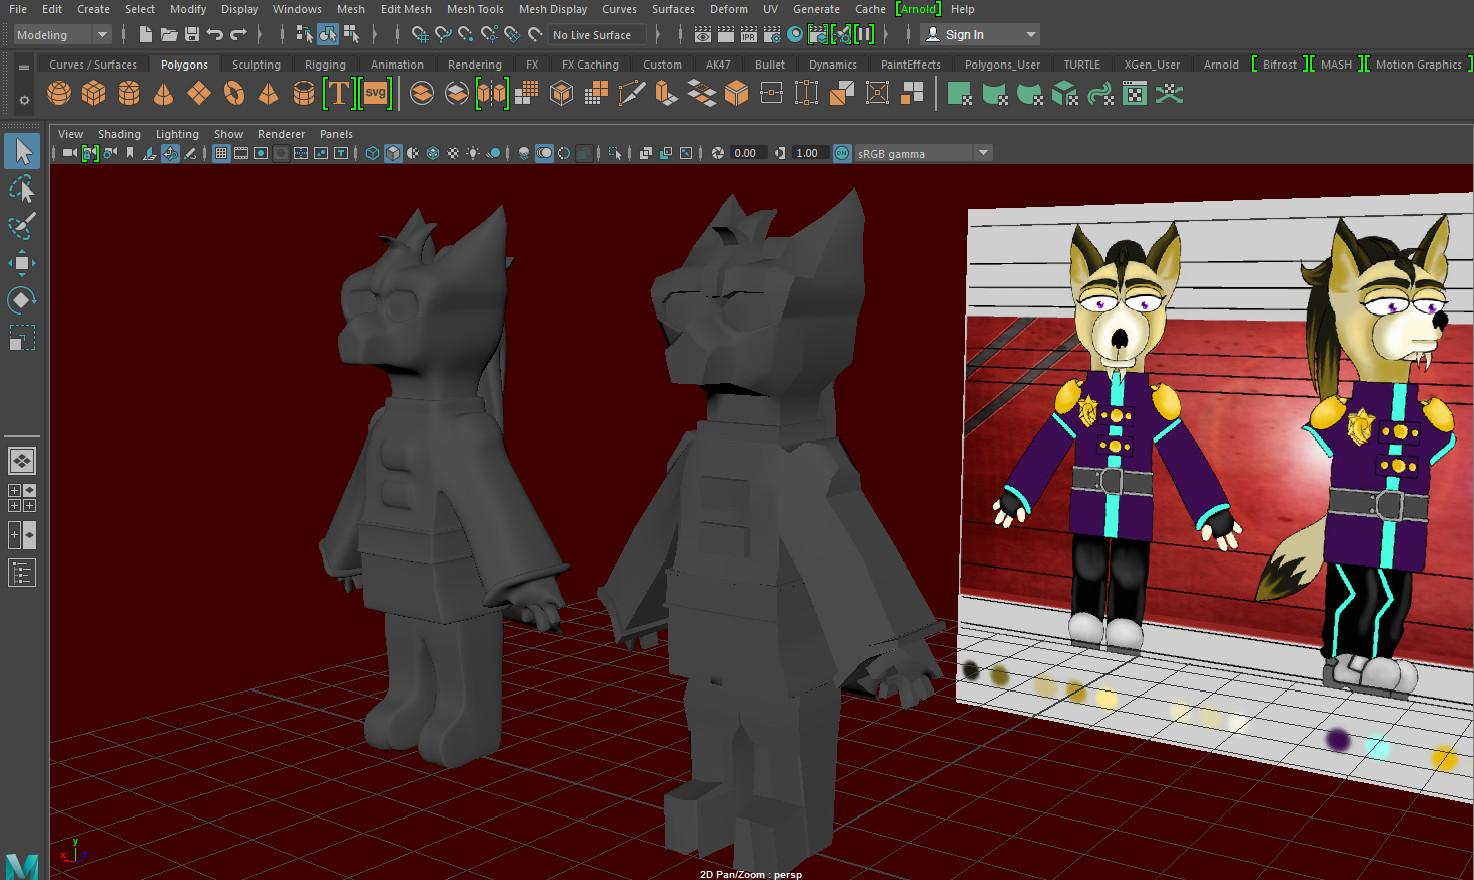 ArtStation - Jessica Jane Fox - 3D Game Character - Jet